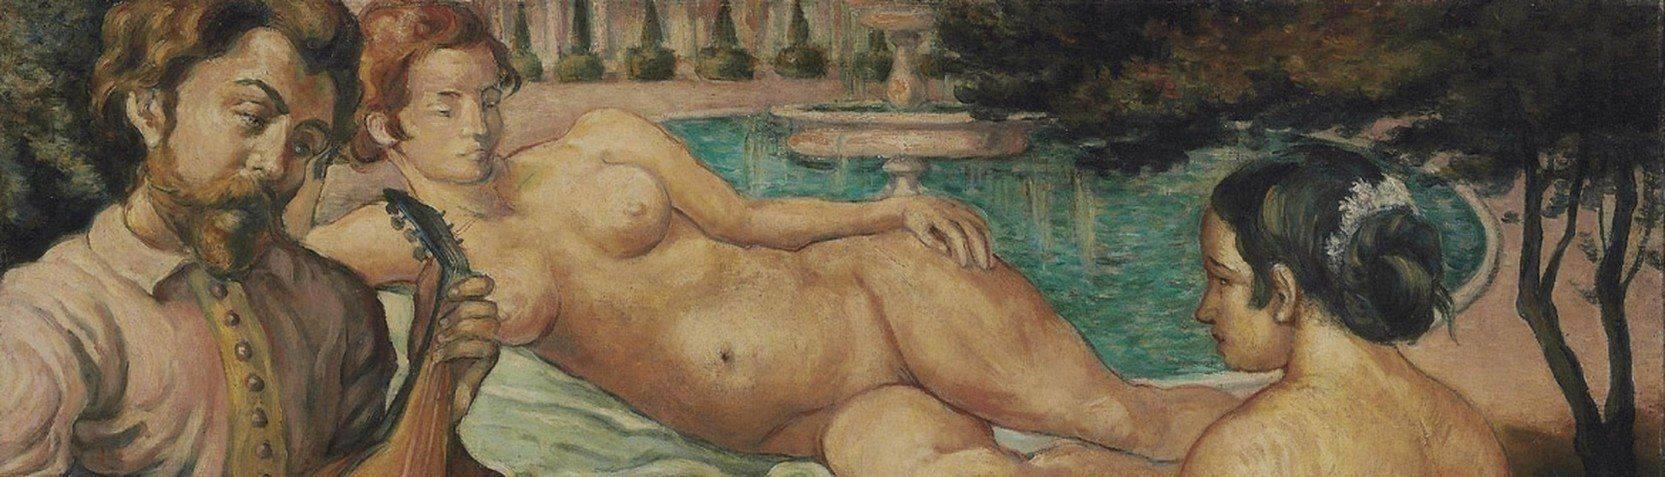 Artists - Emile Bernard